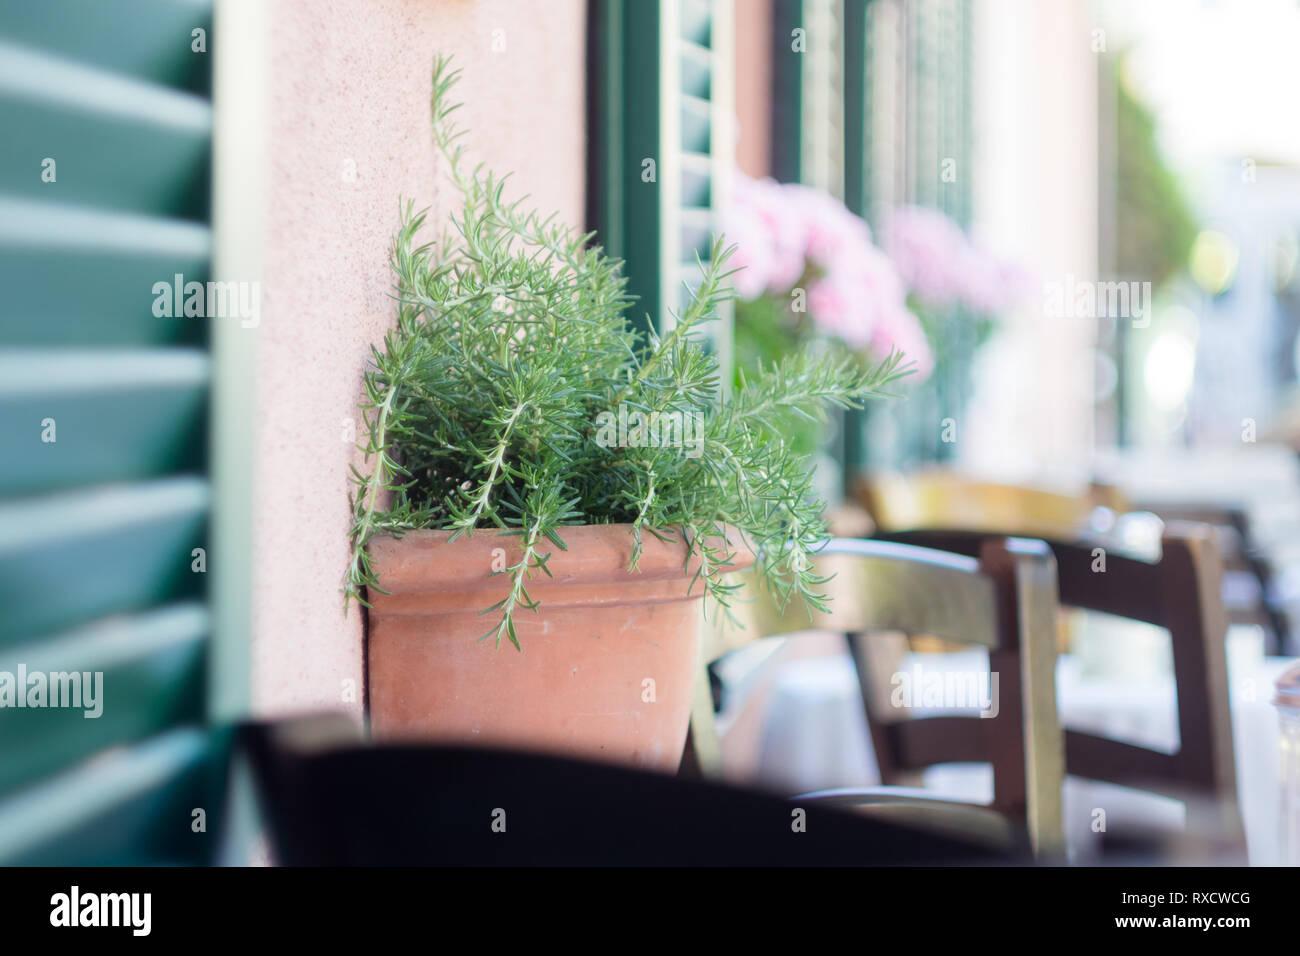 Rosmarin am Fensterbankerl - Stock Image